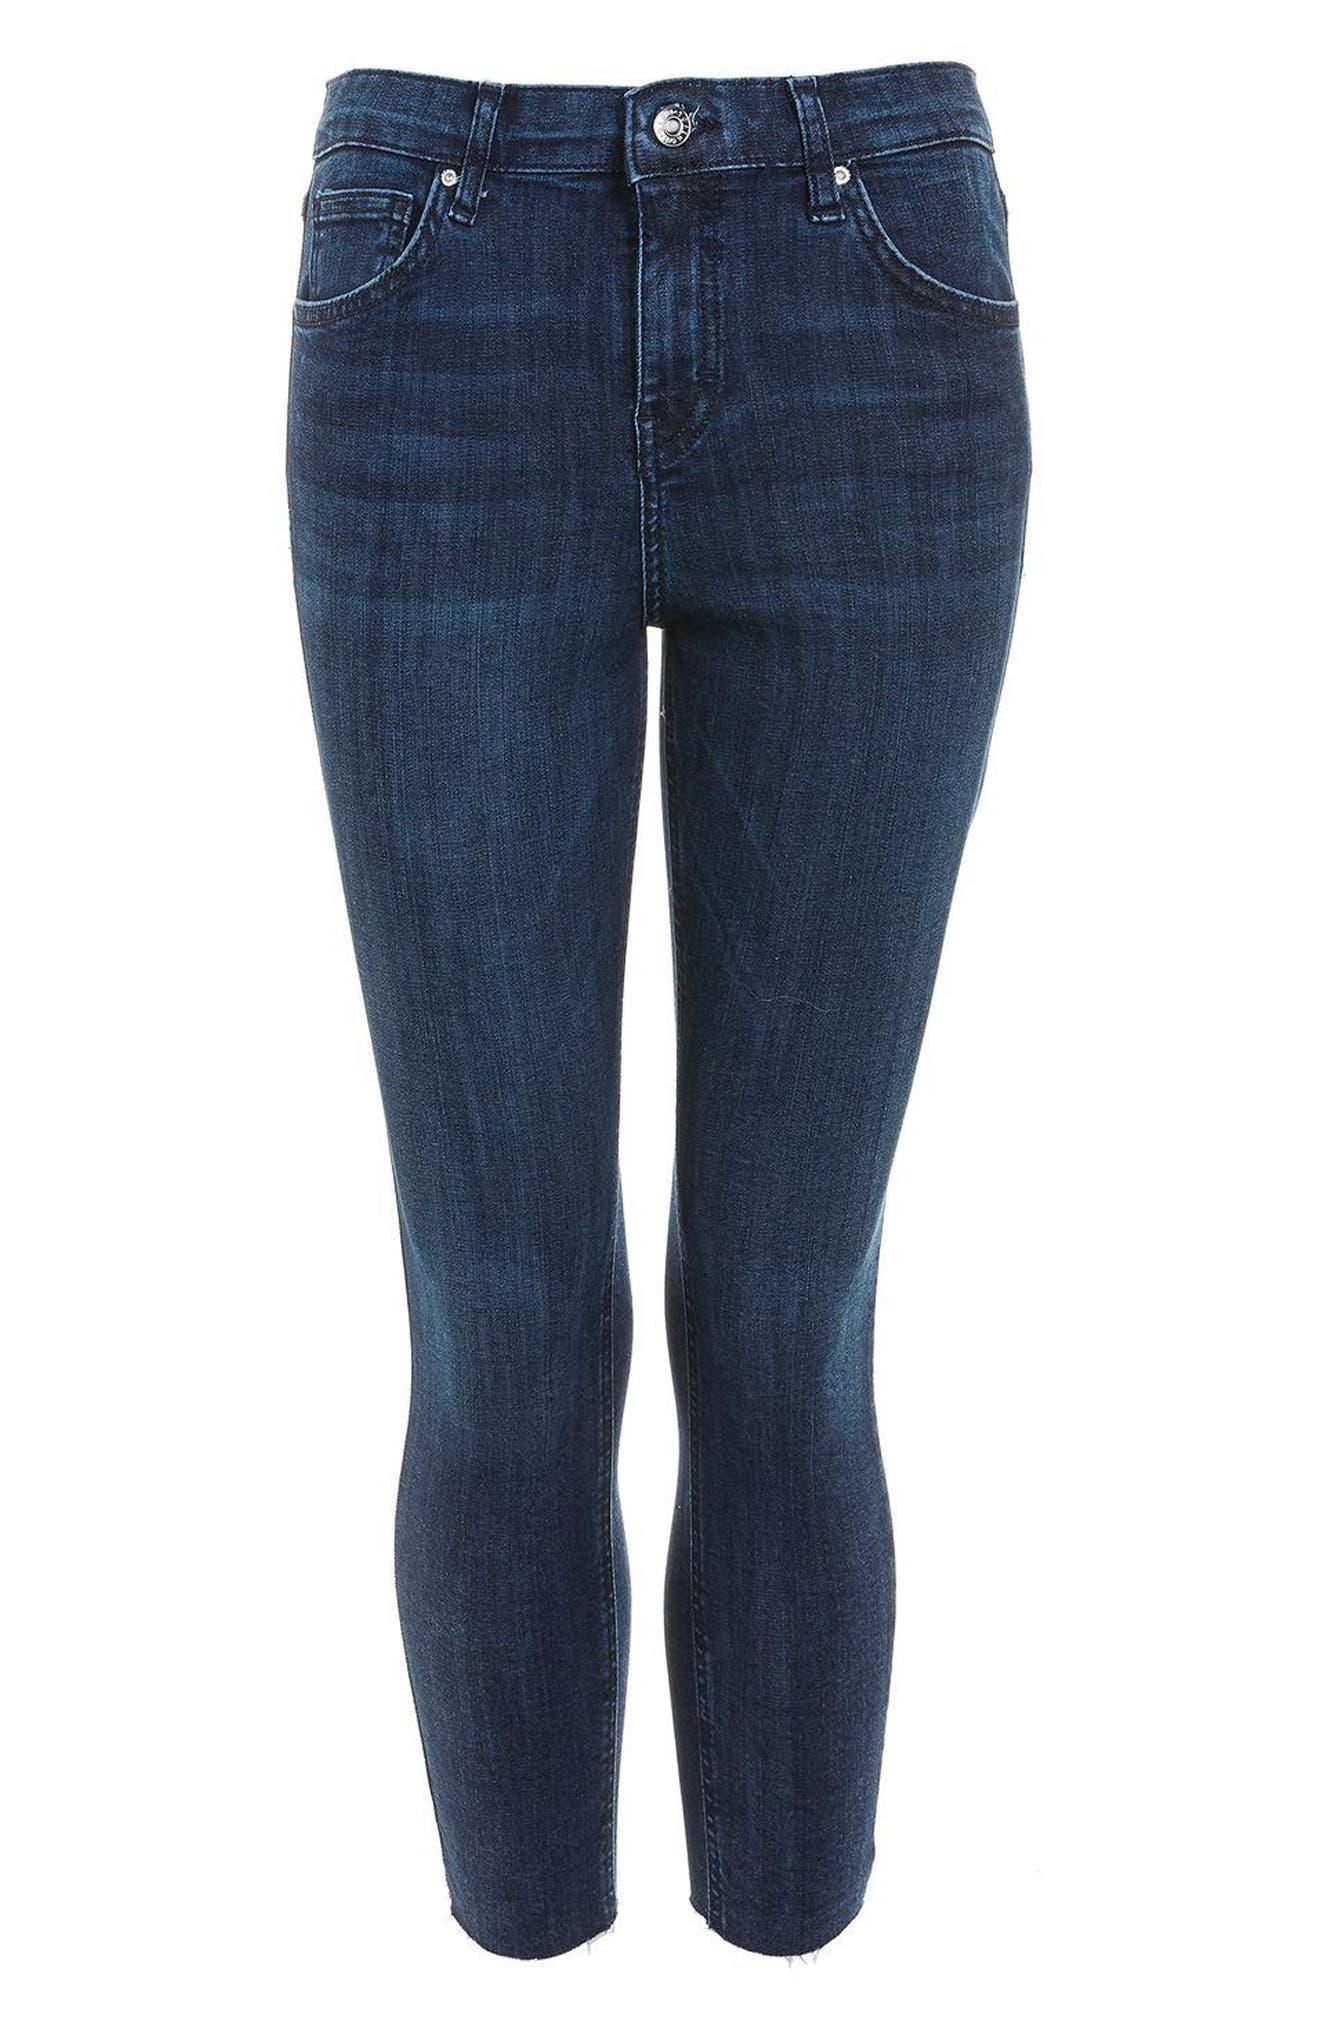 Alternate Image 3  - Topshop Jamie High Waist Skinny Jeans (Petite)